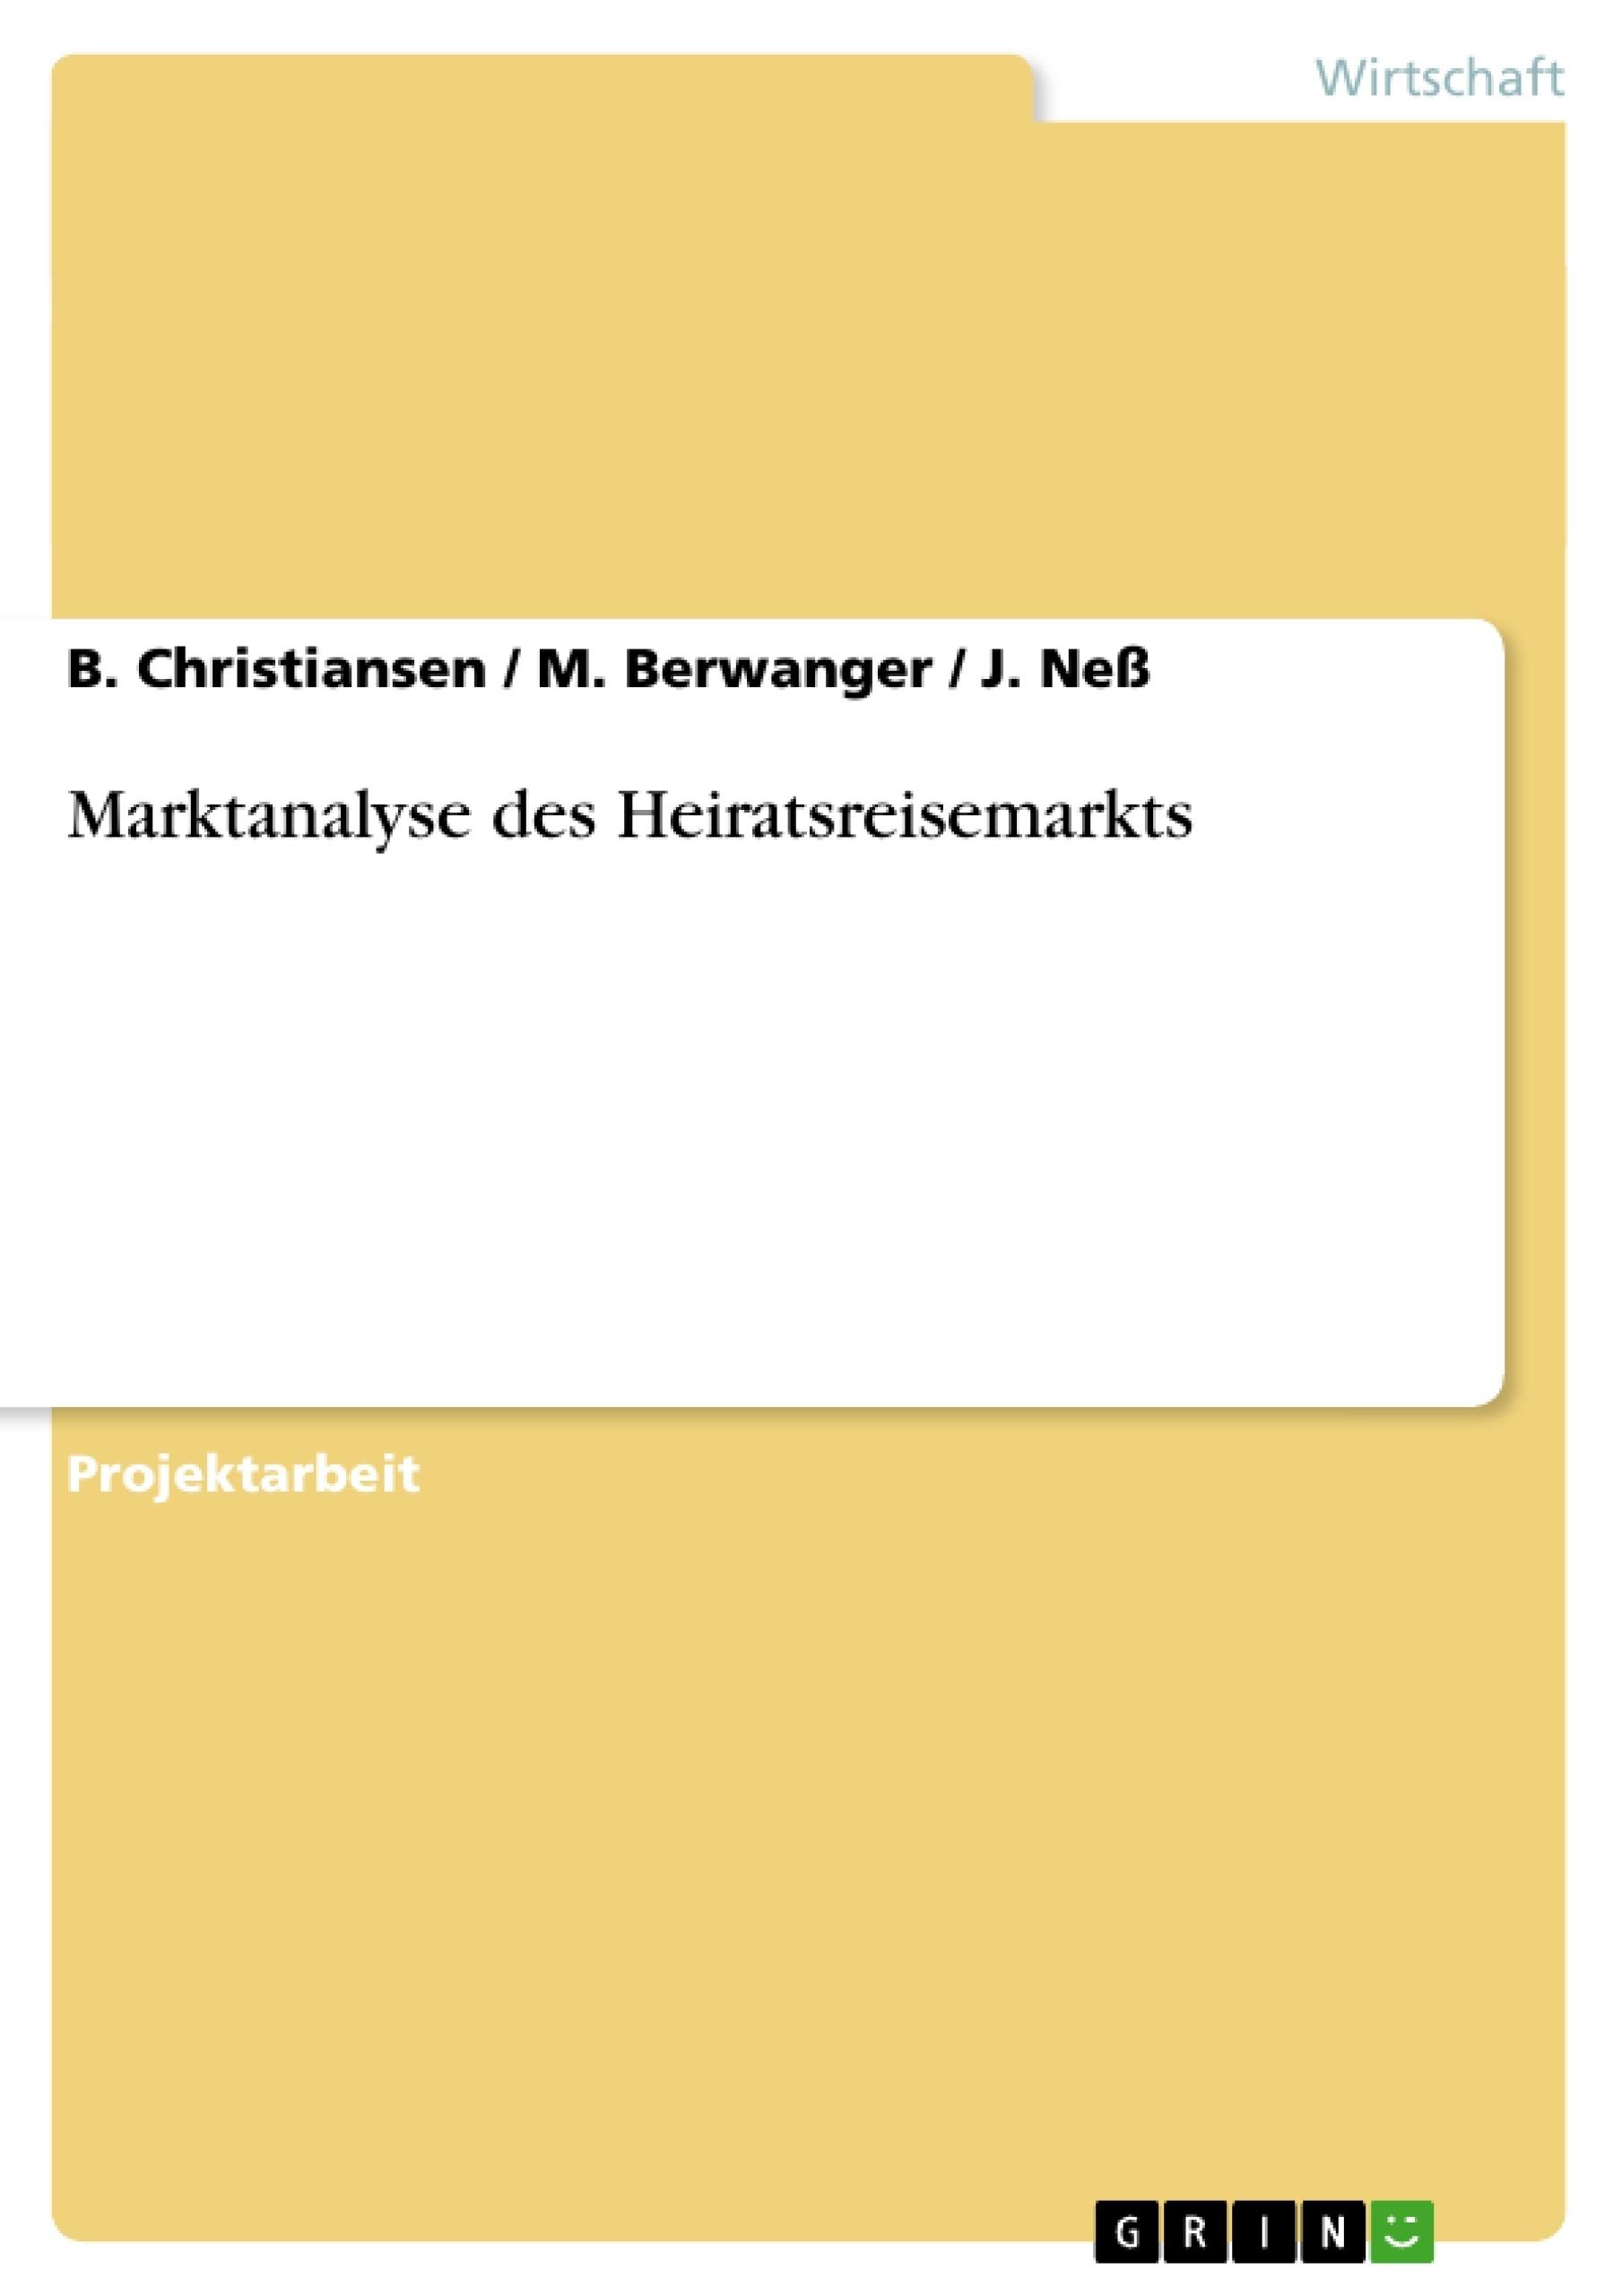 Titel: Marktanalyse des Heiratsreisemarkts